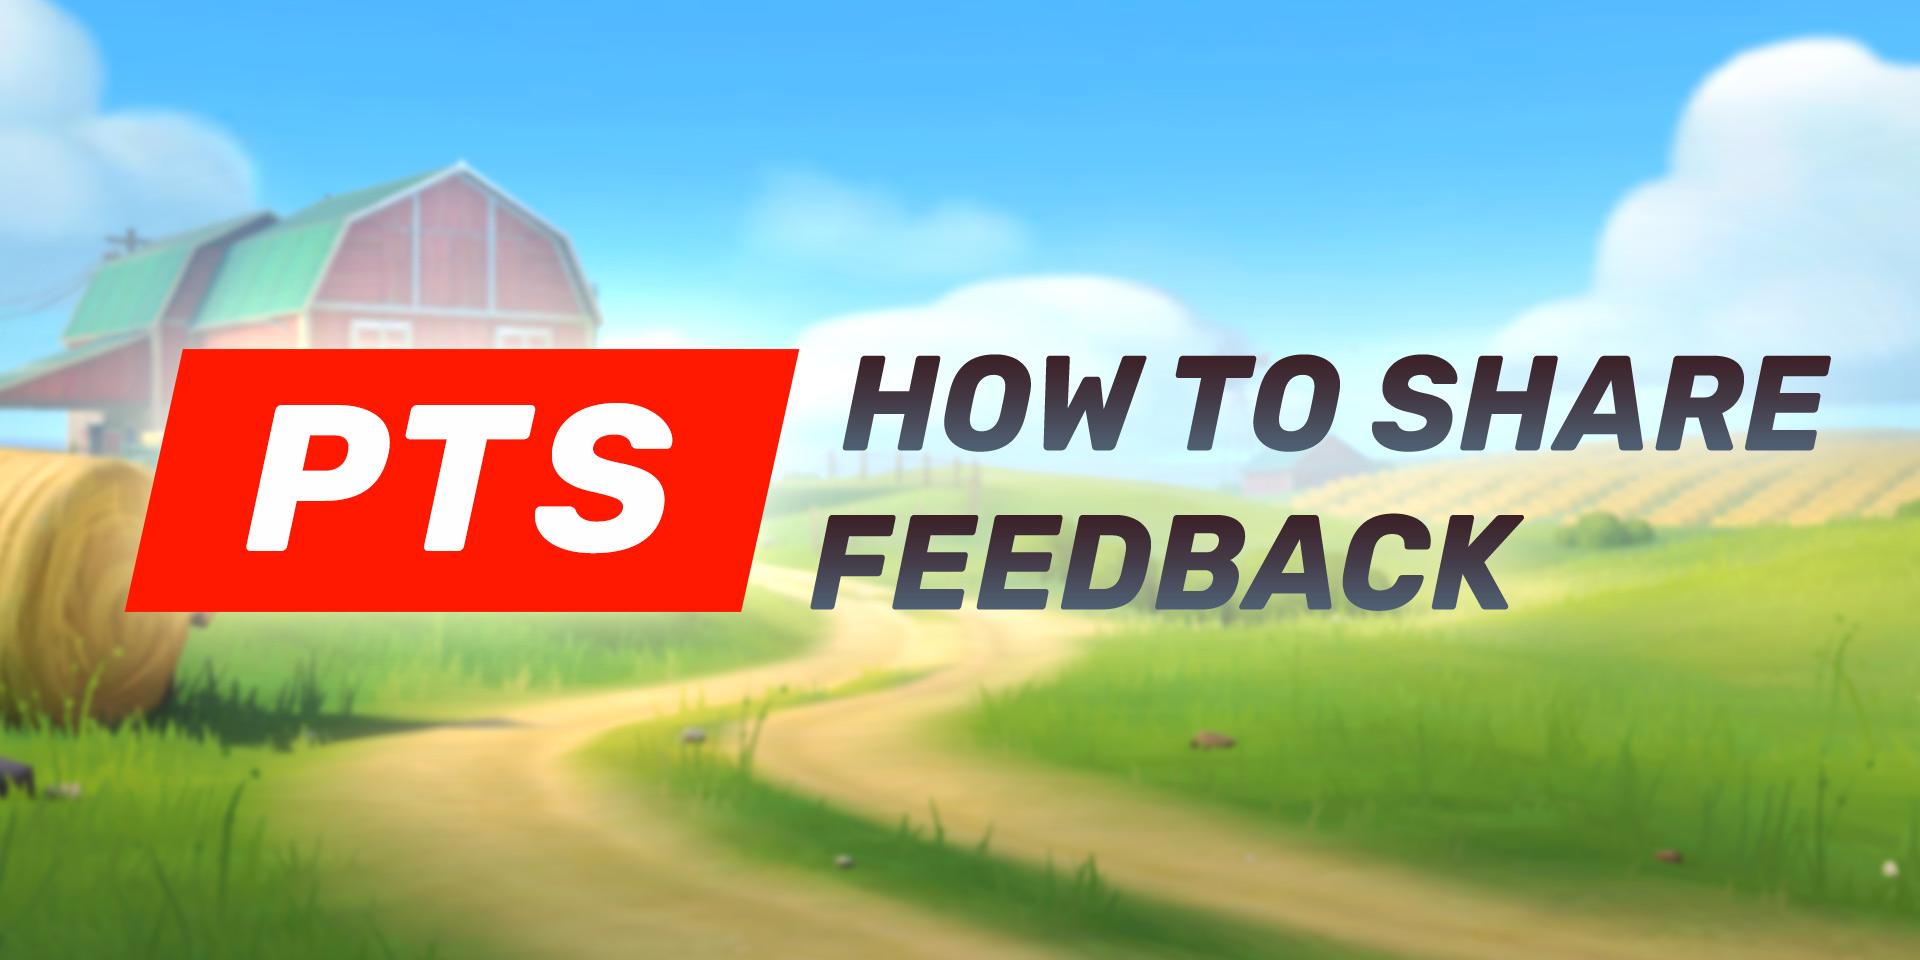 60bf9ddfdf48f_DESIGN-5599_pts-feedback-article-header_EN